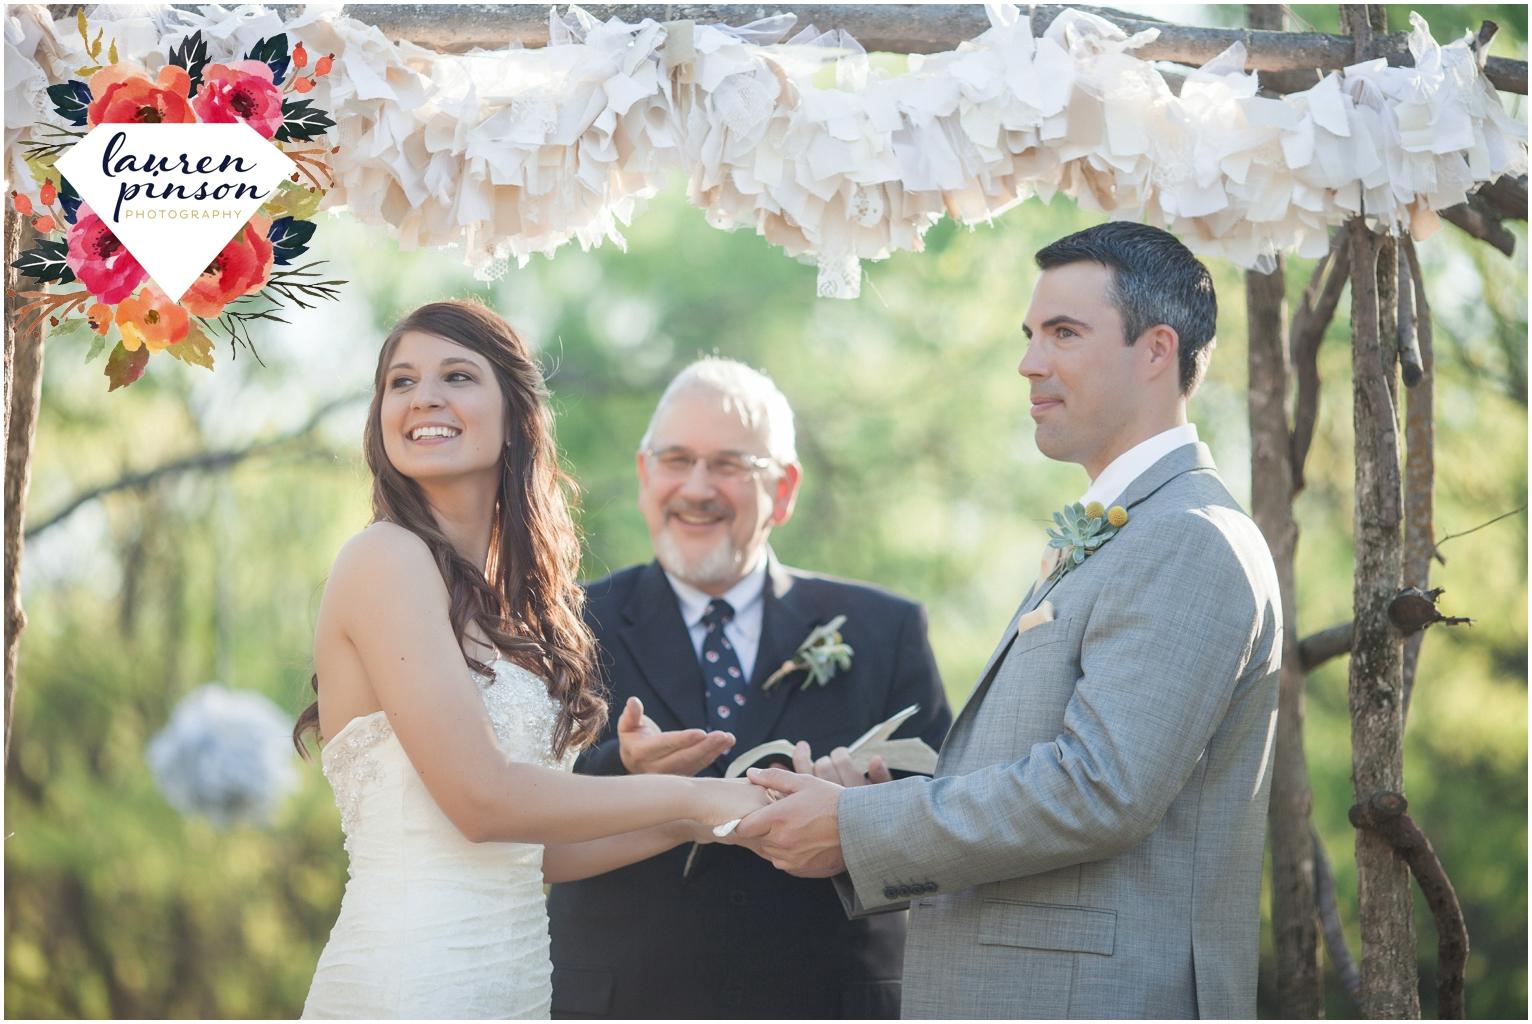 wichita-falls-wedding-photographer-oklahoma-wichita-mountains-bridal-session-bridals-photography_0743.jpg